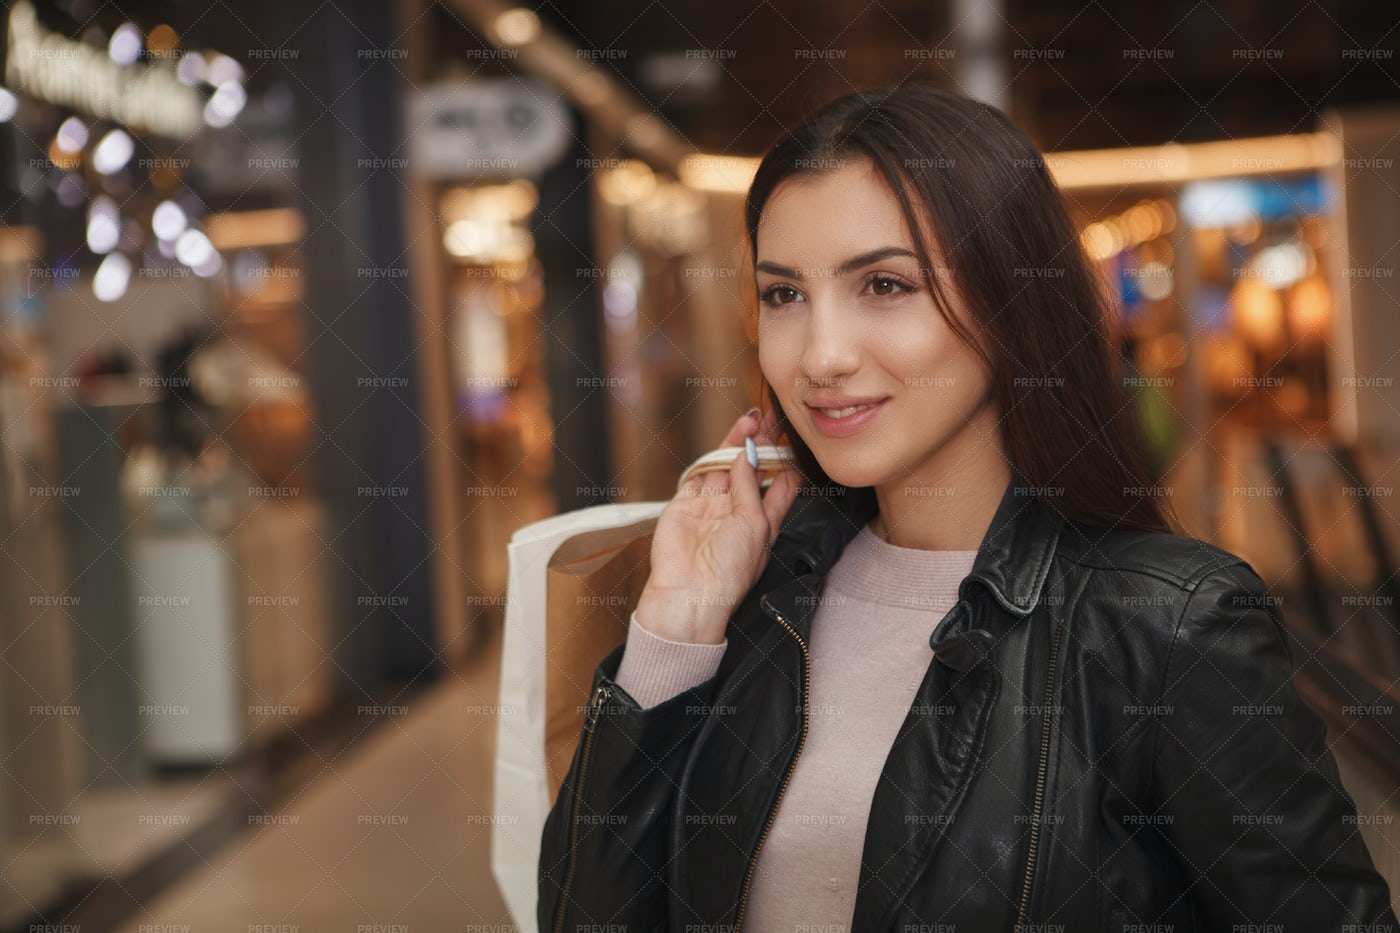 Woman At Shopping Mall: Stock Photos